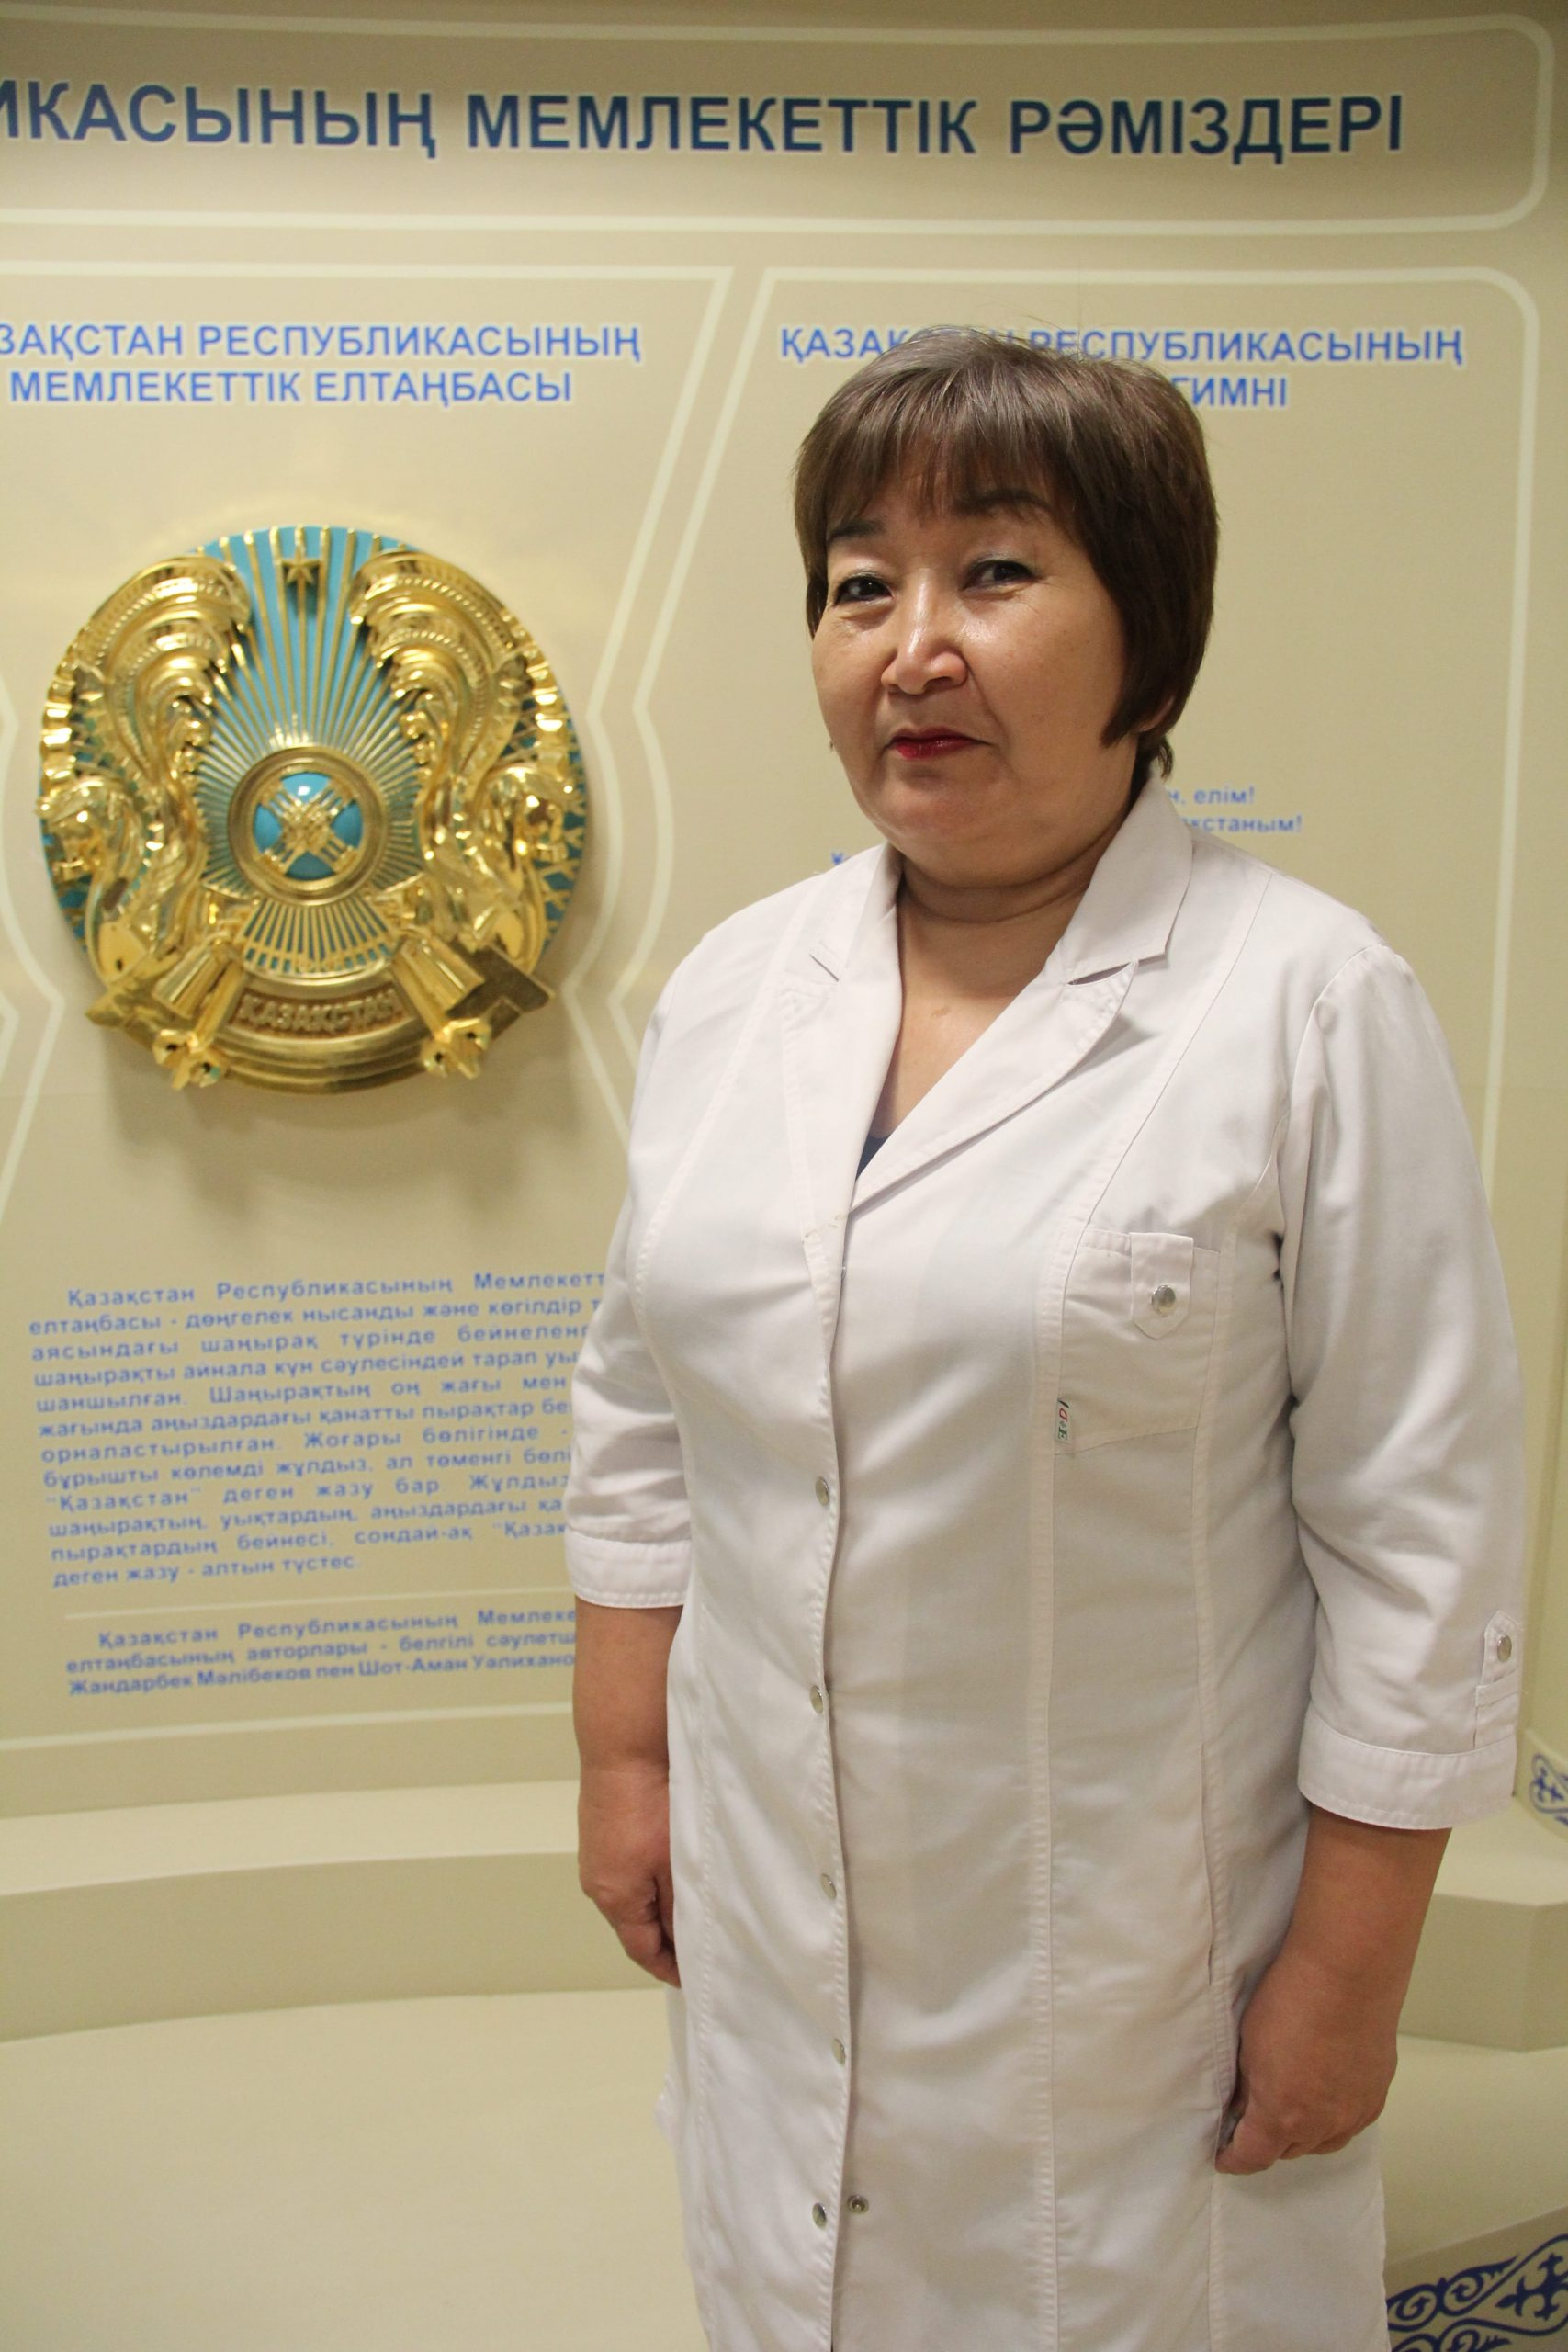 Сарсембаева Сауле Сапаровна